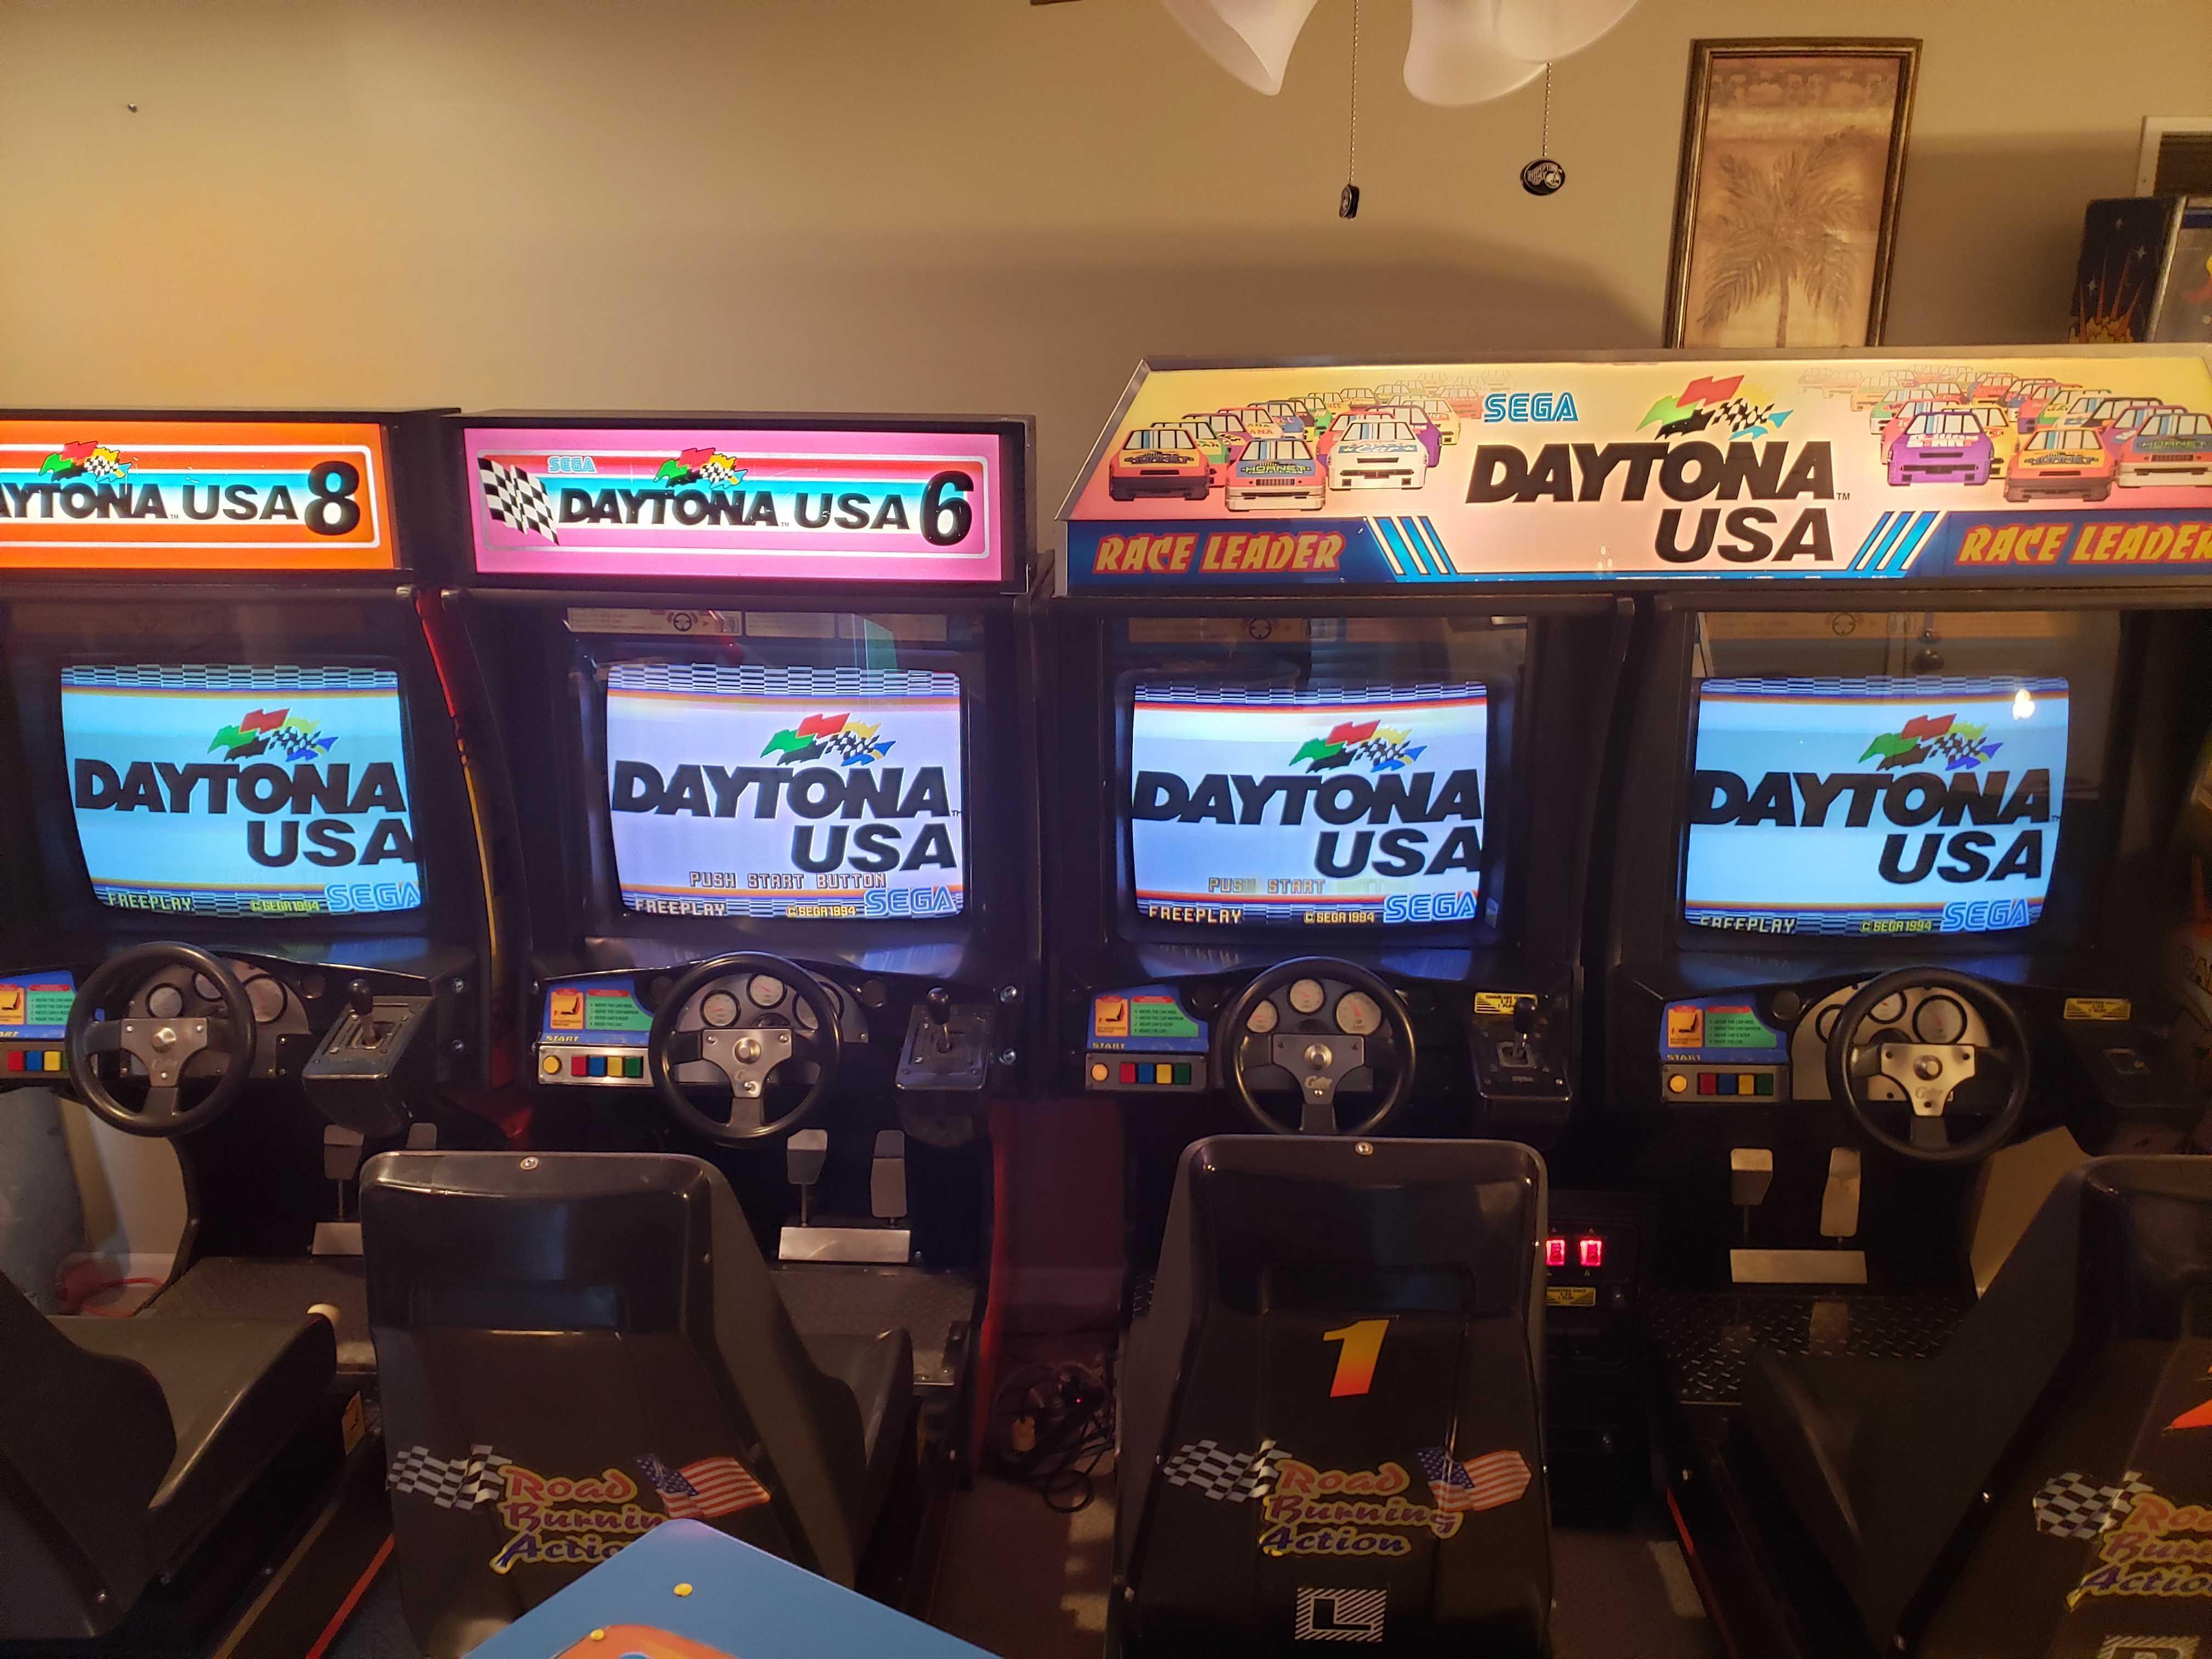 Arcade Cabinet Restoration of Daytona U.S.A. games